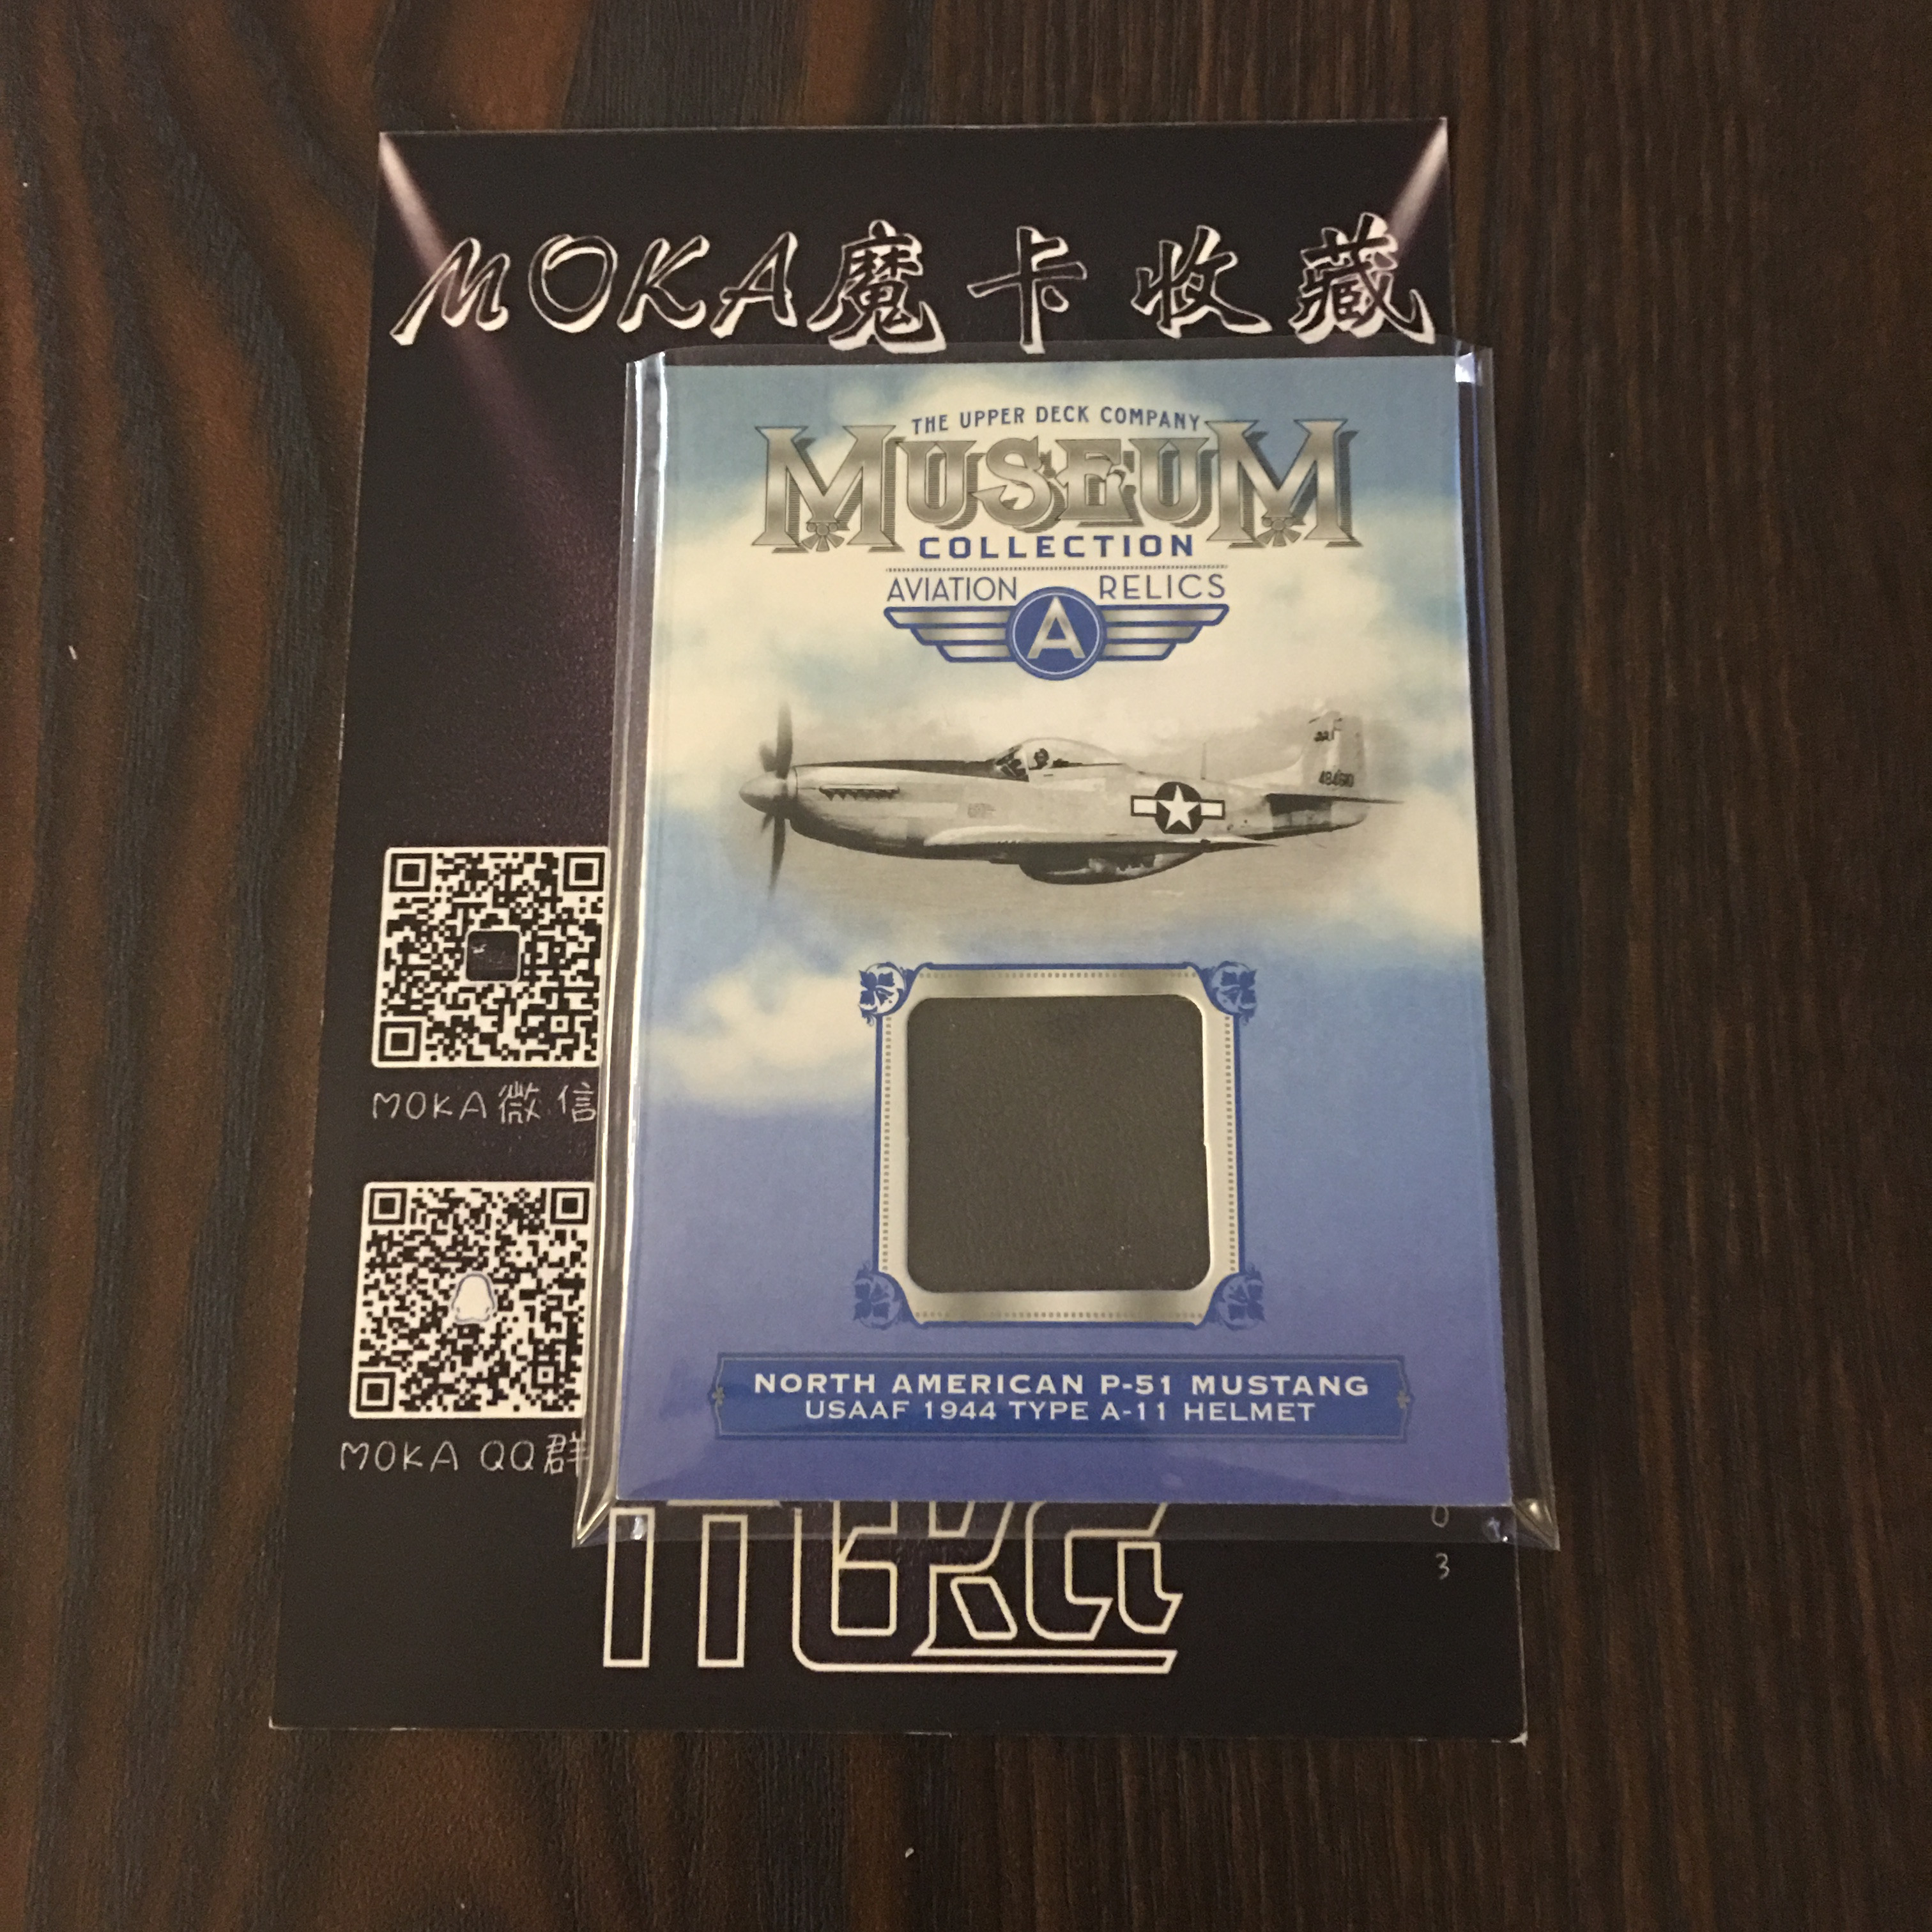 【MOKA球星卡收藏】#1804452 2018 UD Goodwin 古德温 博物馆 P-51战斗机 野马 实物 比例 1::4761 超大比例 收藏迷别错过